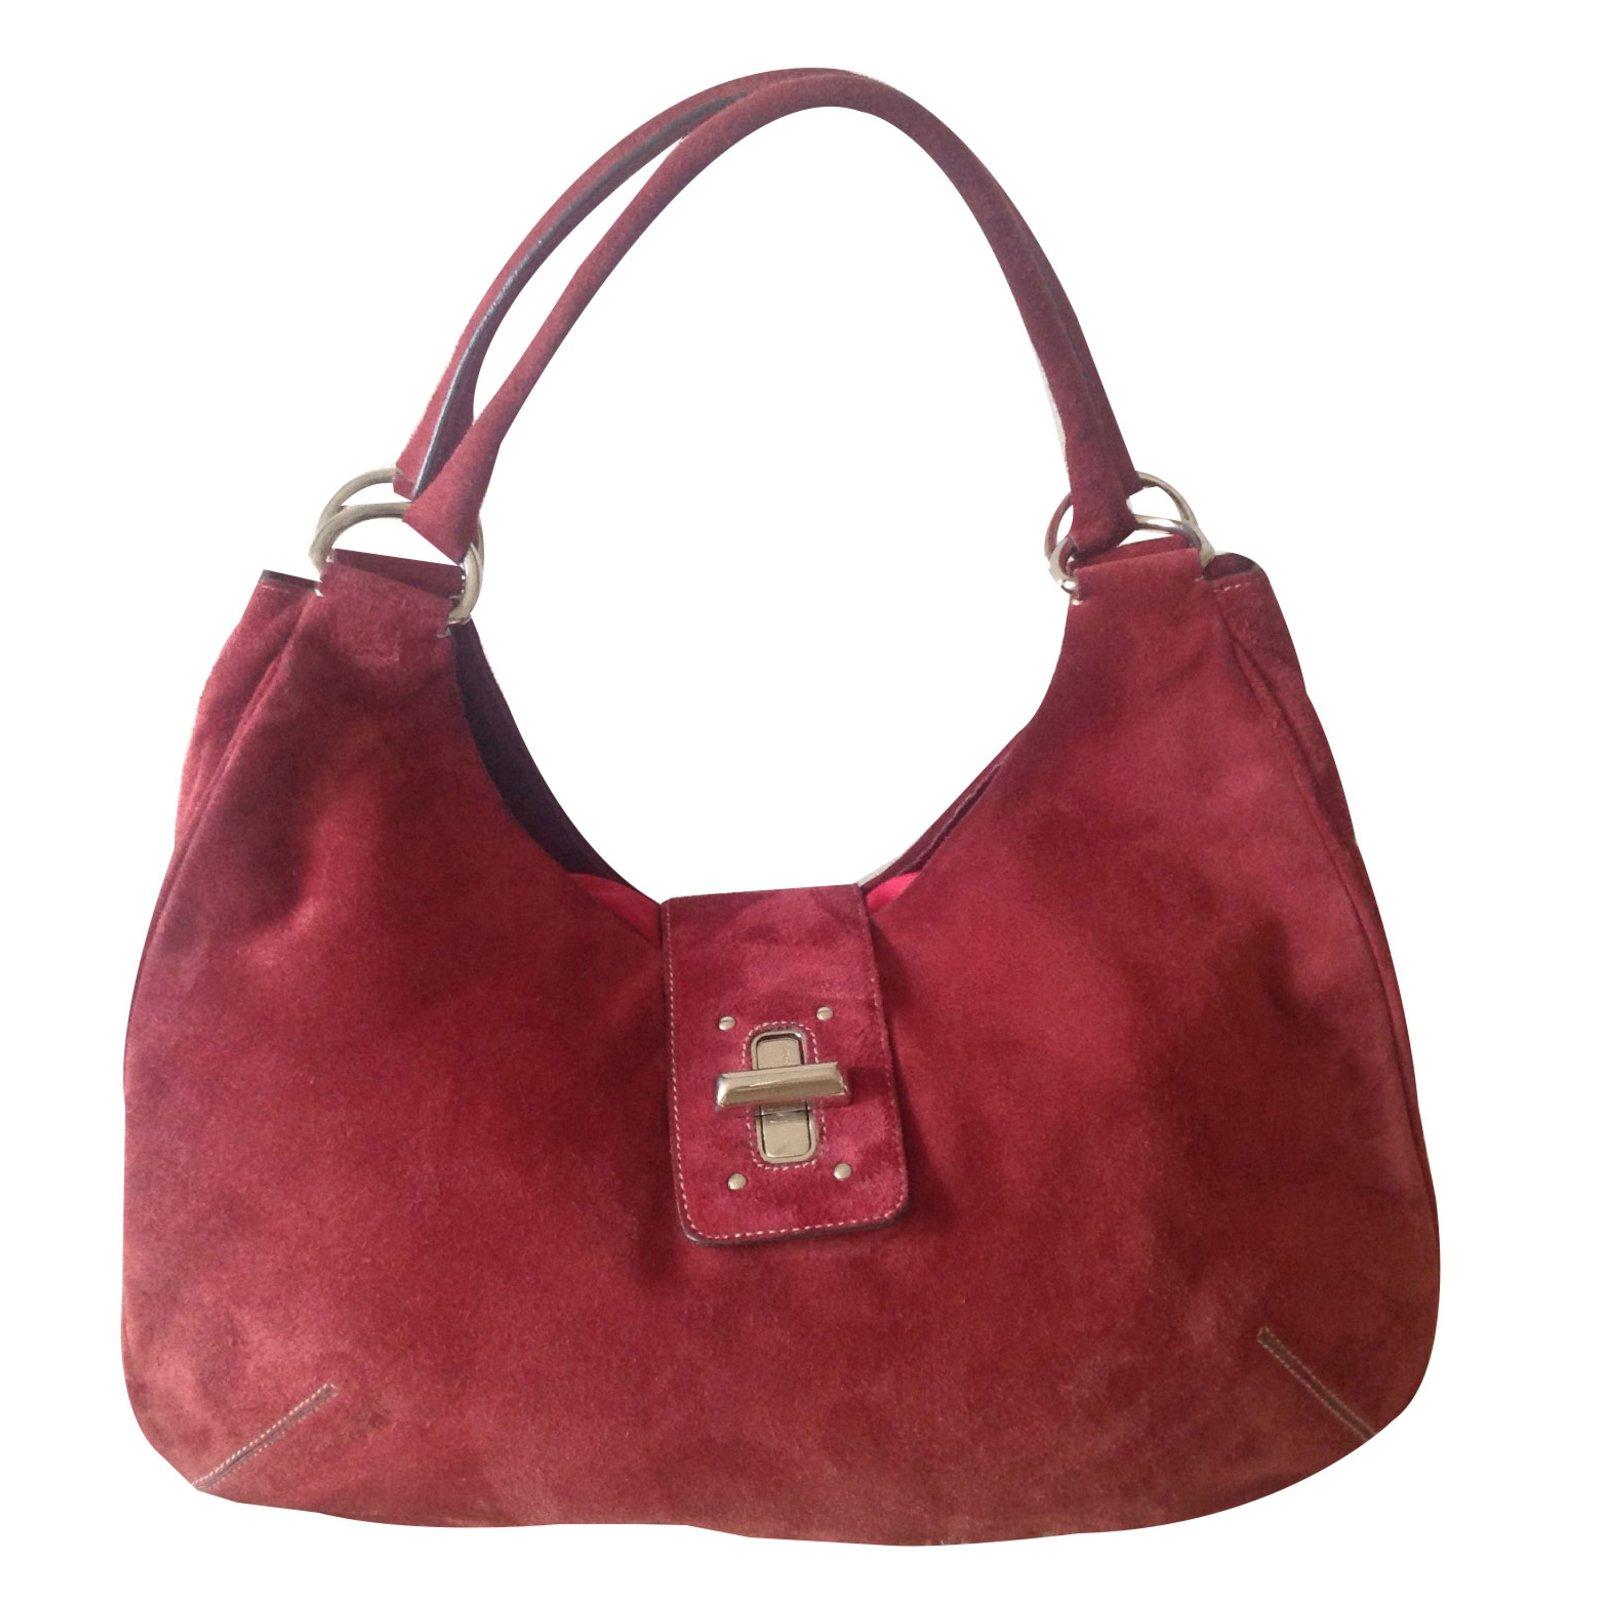 Prada Handbags Handbags Deerskin Dark red ref.49292 - Joli Closet